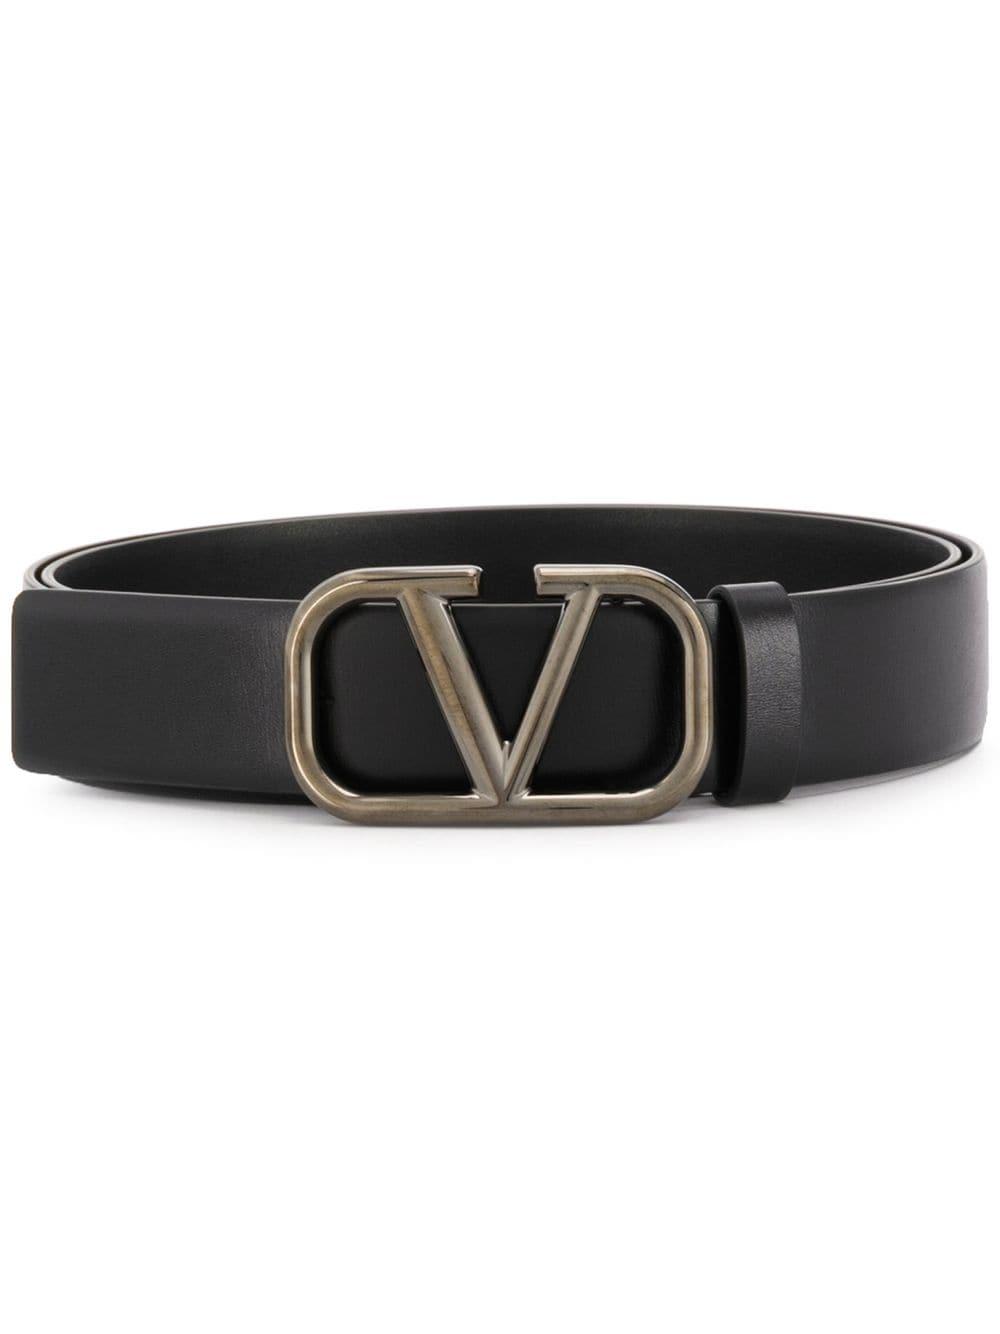 Logo Leather Belts